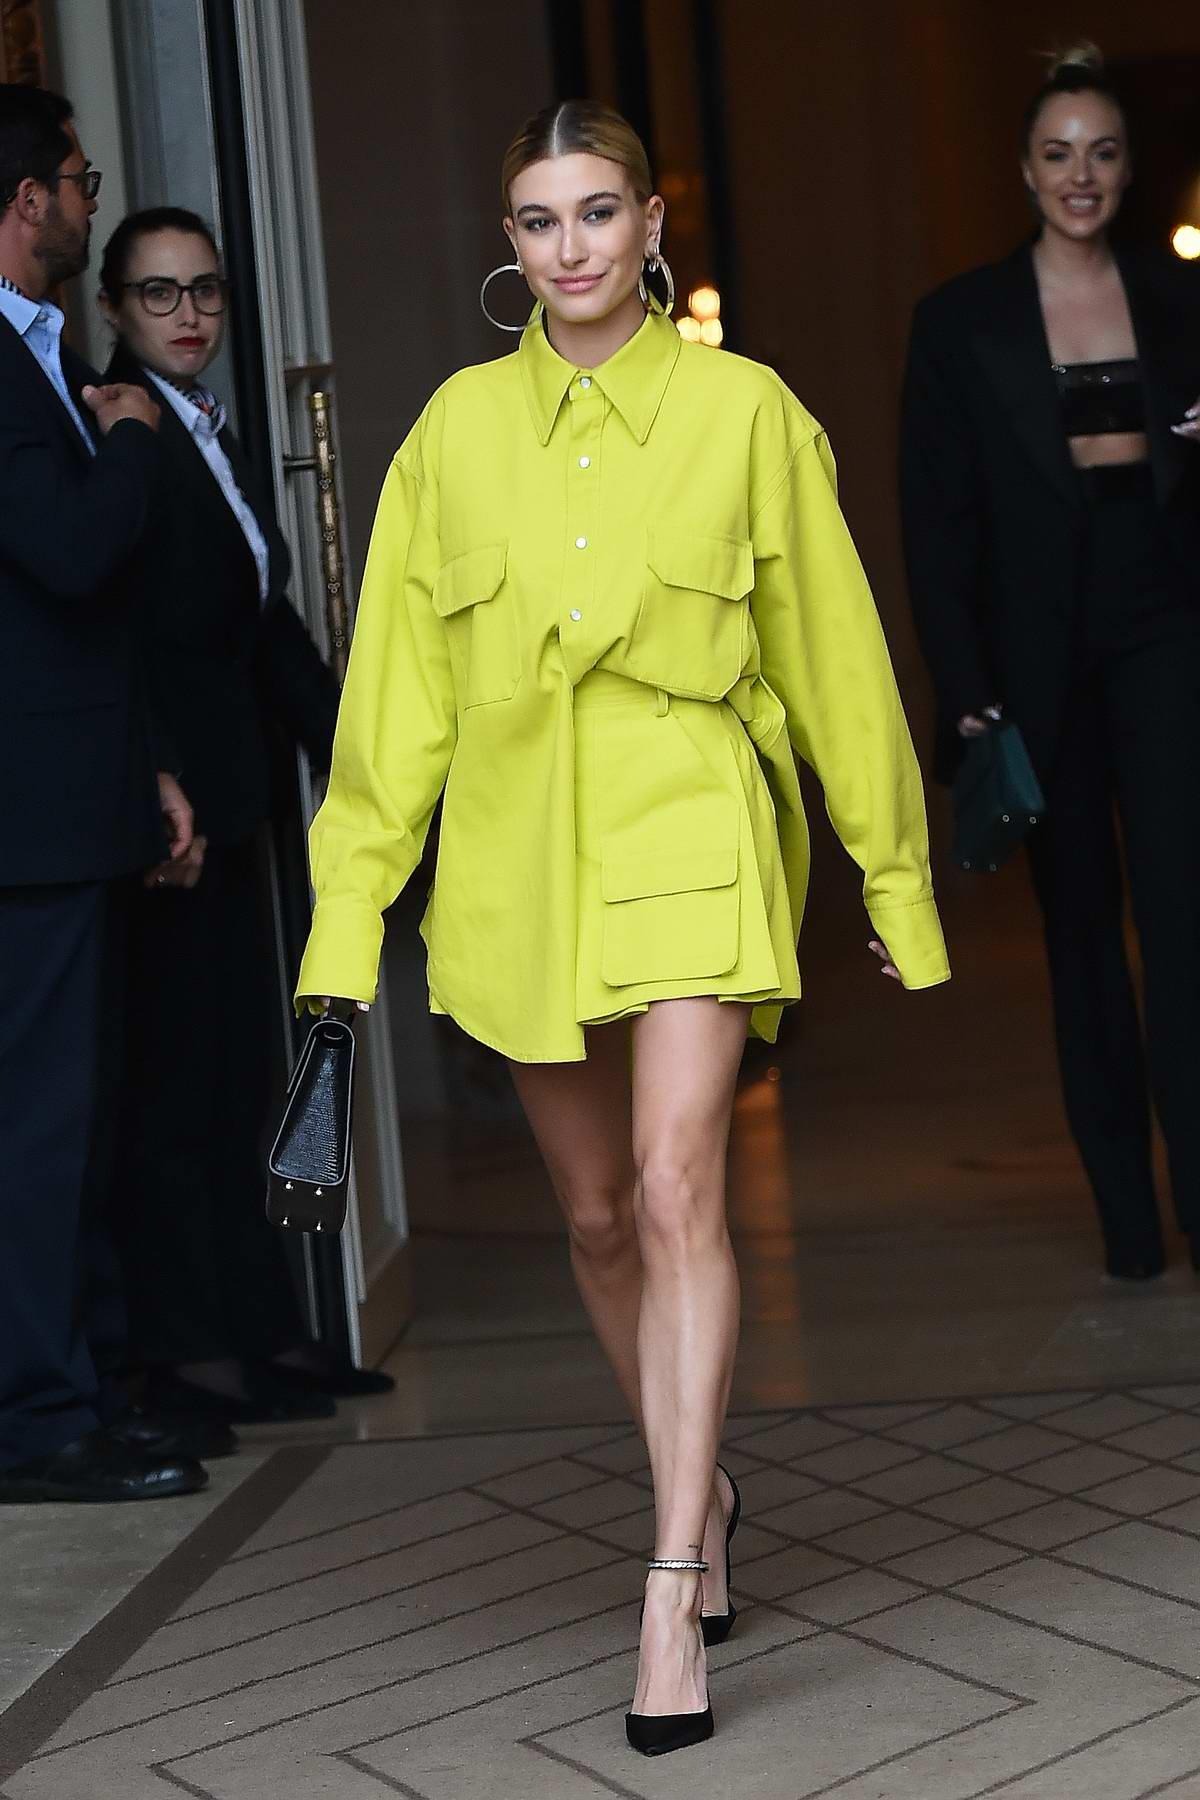 Hailey Baldwin Bieber rocks a short bright green dress while visiting Balmain in Paris, France